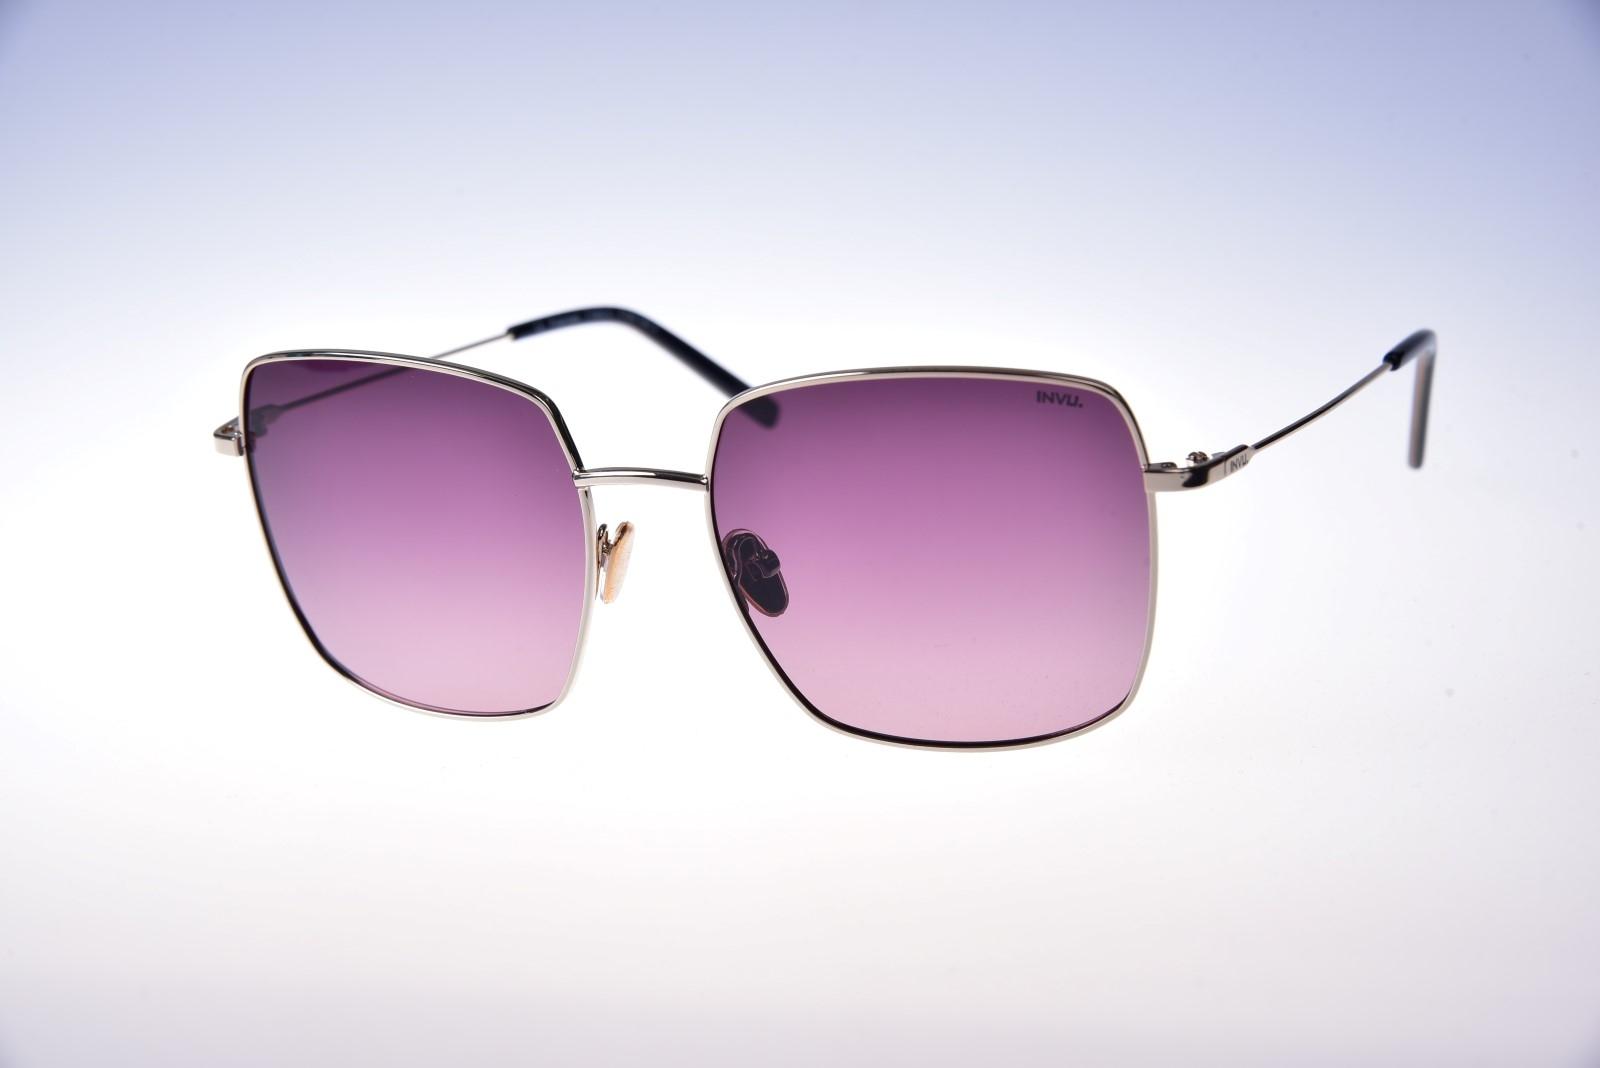 INVU. Trend T1900C - Dámske slnečné okuliare